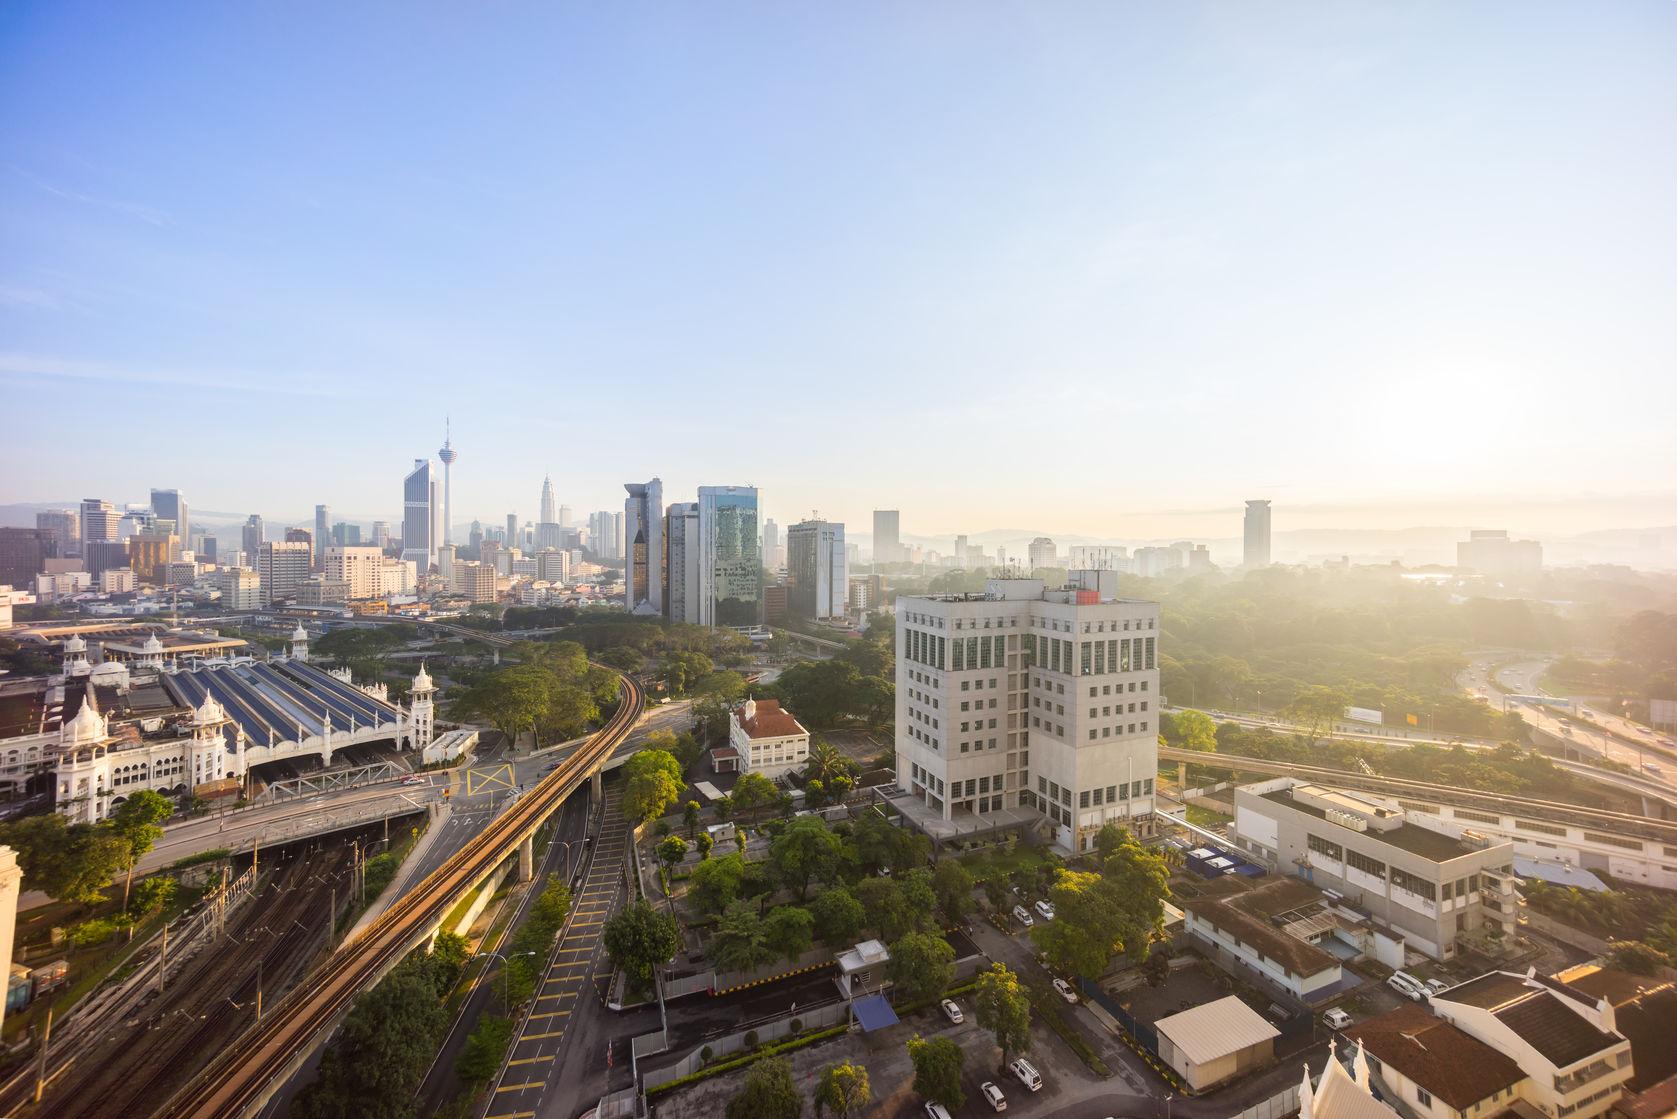 TOD, Sentral Suites, KL sentral, Aster Residence, Cheras, Greenfield Residence, Bandar Sunway, Damansara Damai, Damansara North, Tropicana Gardens, Kota Damansara